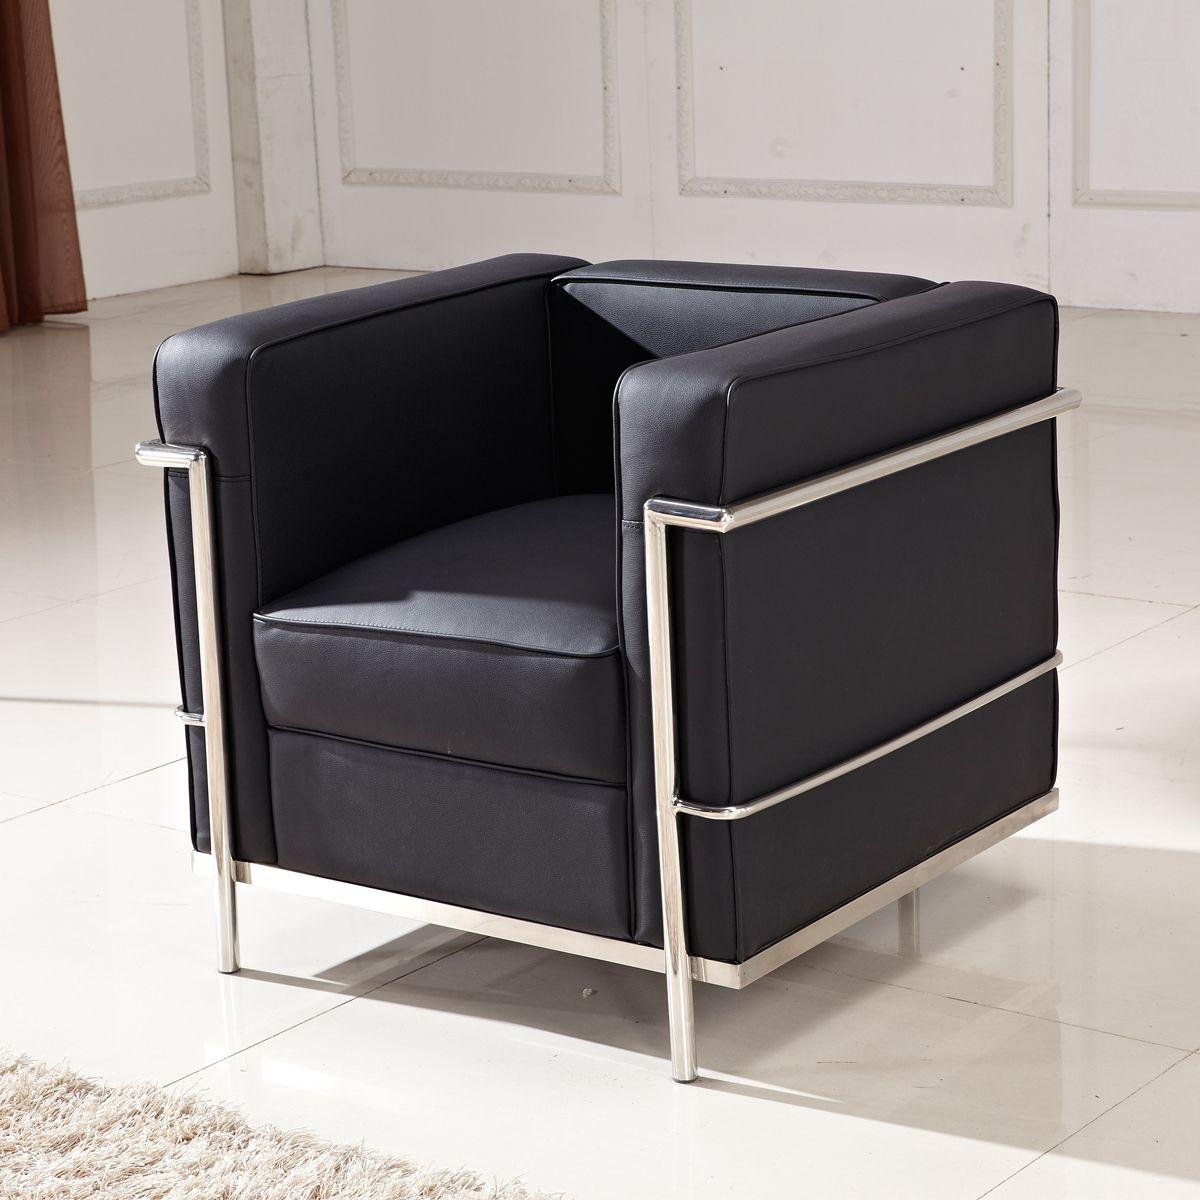 Compre Le Corbusier Lc2 Sof Sof Petit Comfort Cuero Genuino  # Muebles Campo Gibraltar